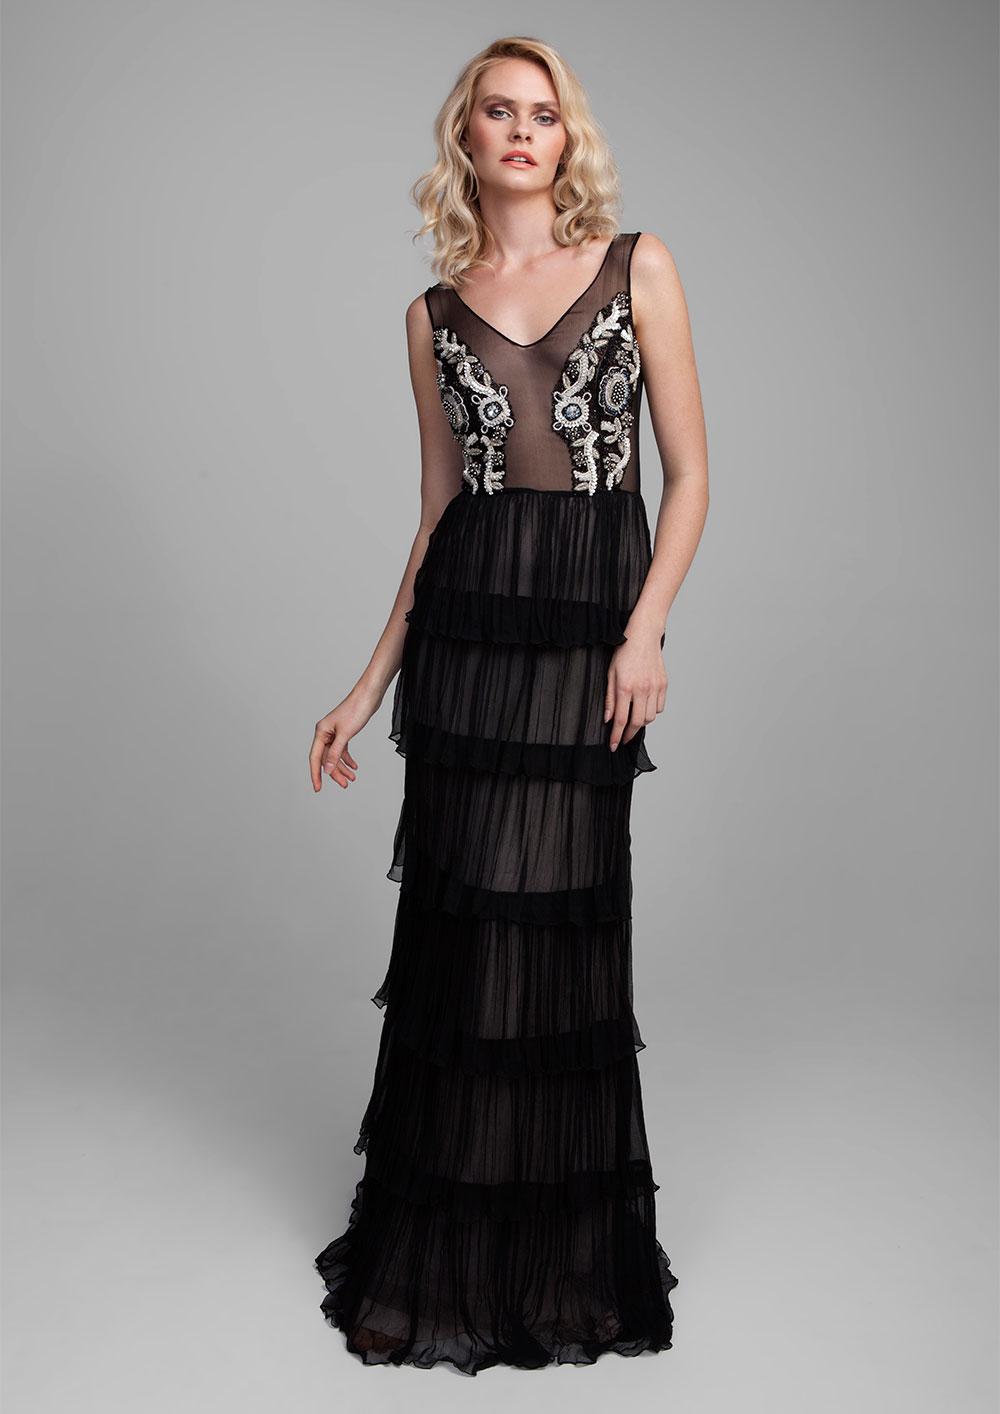 Ceillia evening gown